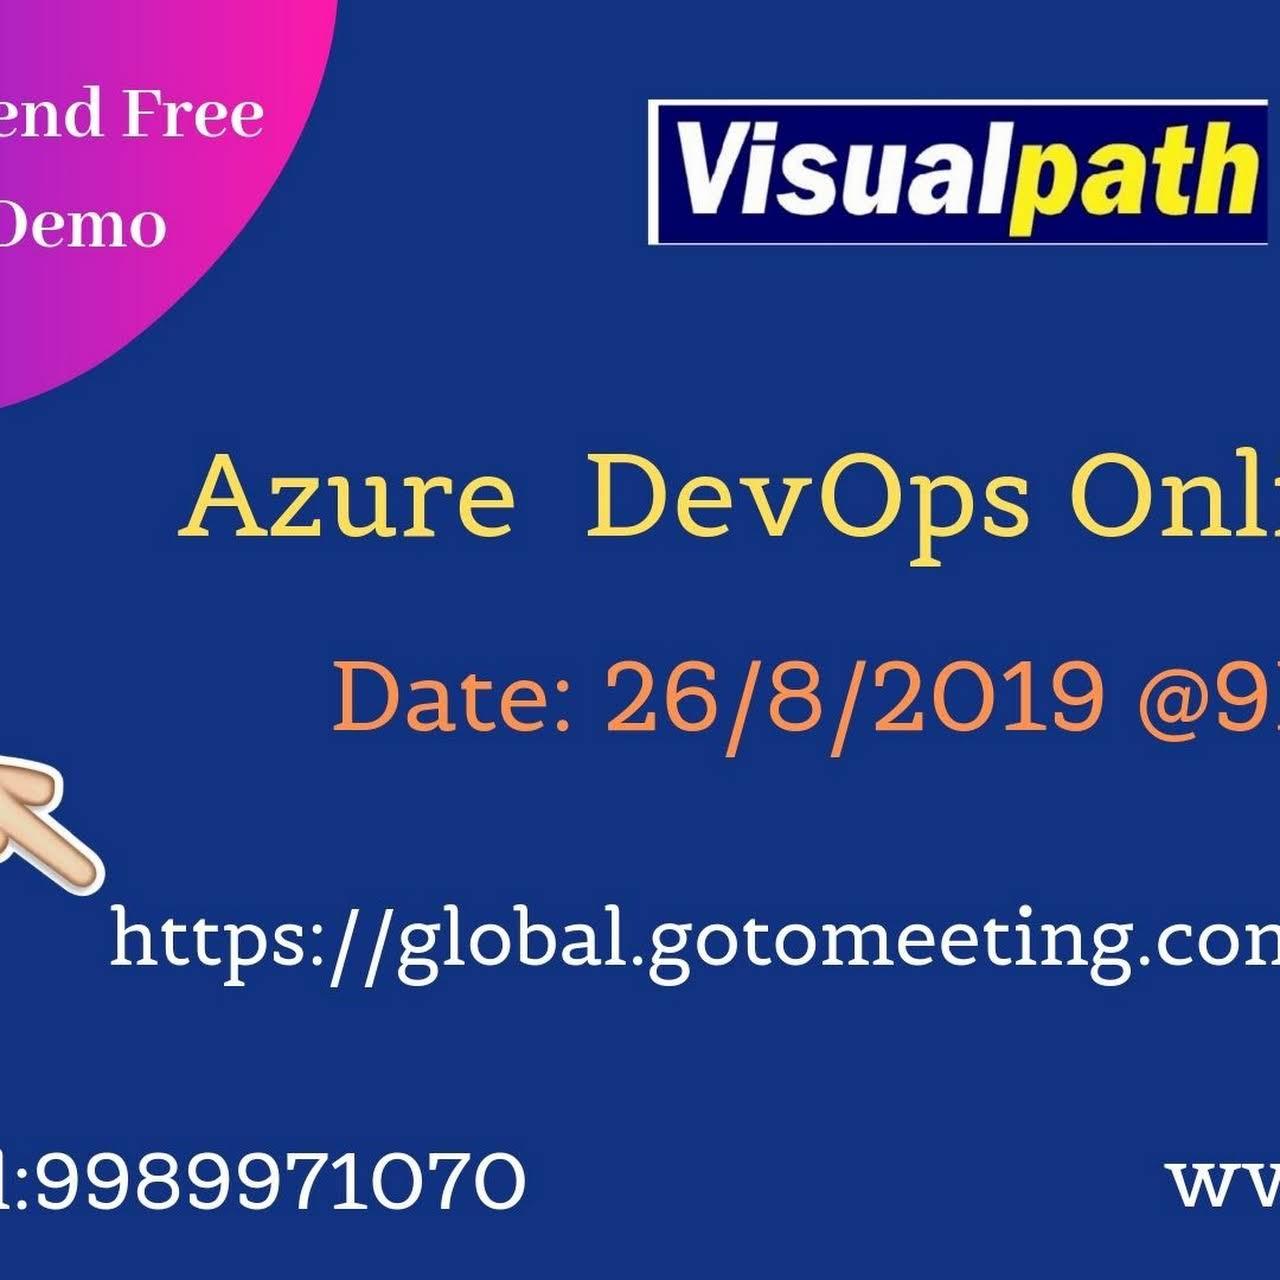 Visualpath-Devops, AWS, MS Azure, ServiceNow, Full Stack